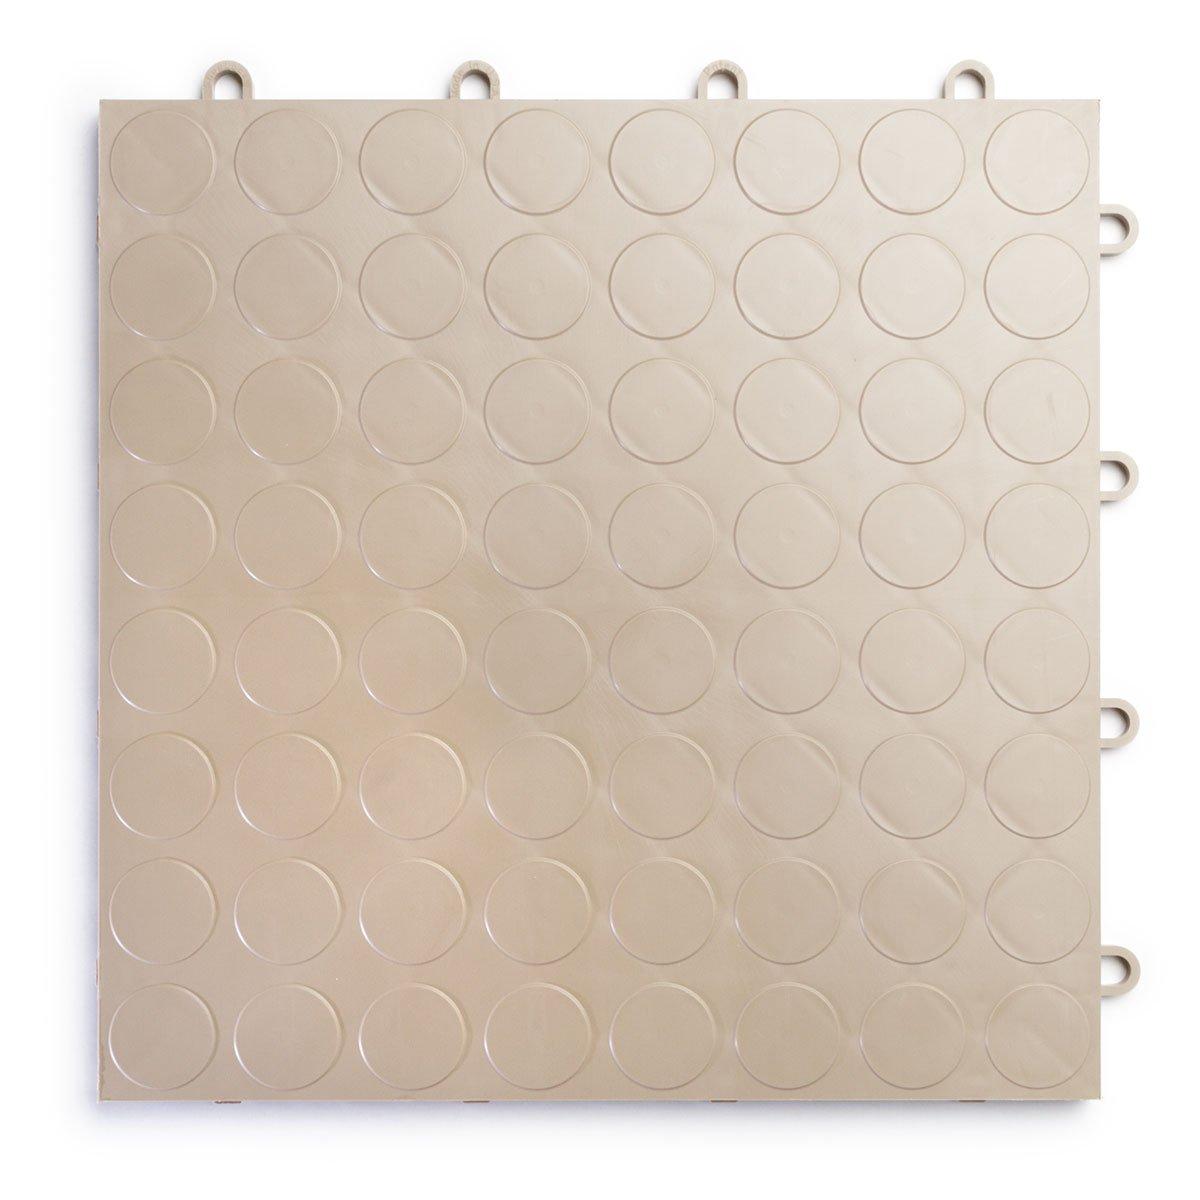 RaceDeck CircleTrac, Durable Interlocking Modular Garage Flooring Tile (12 Pack), Beige